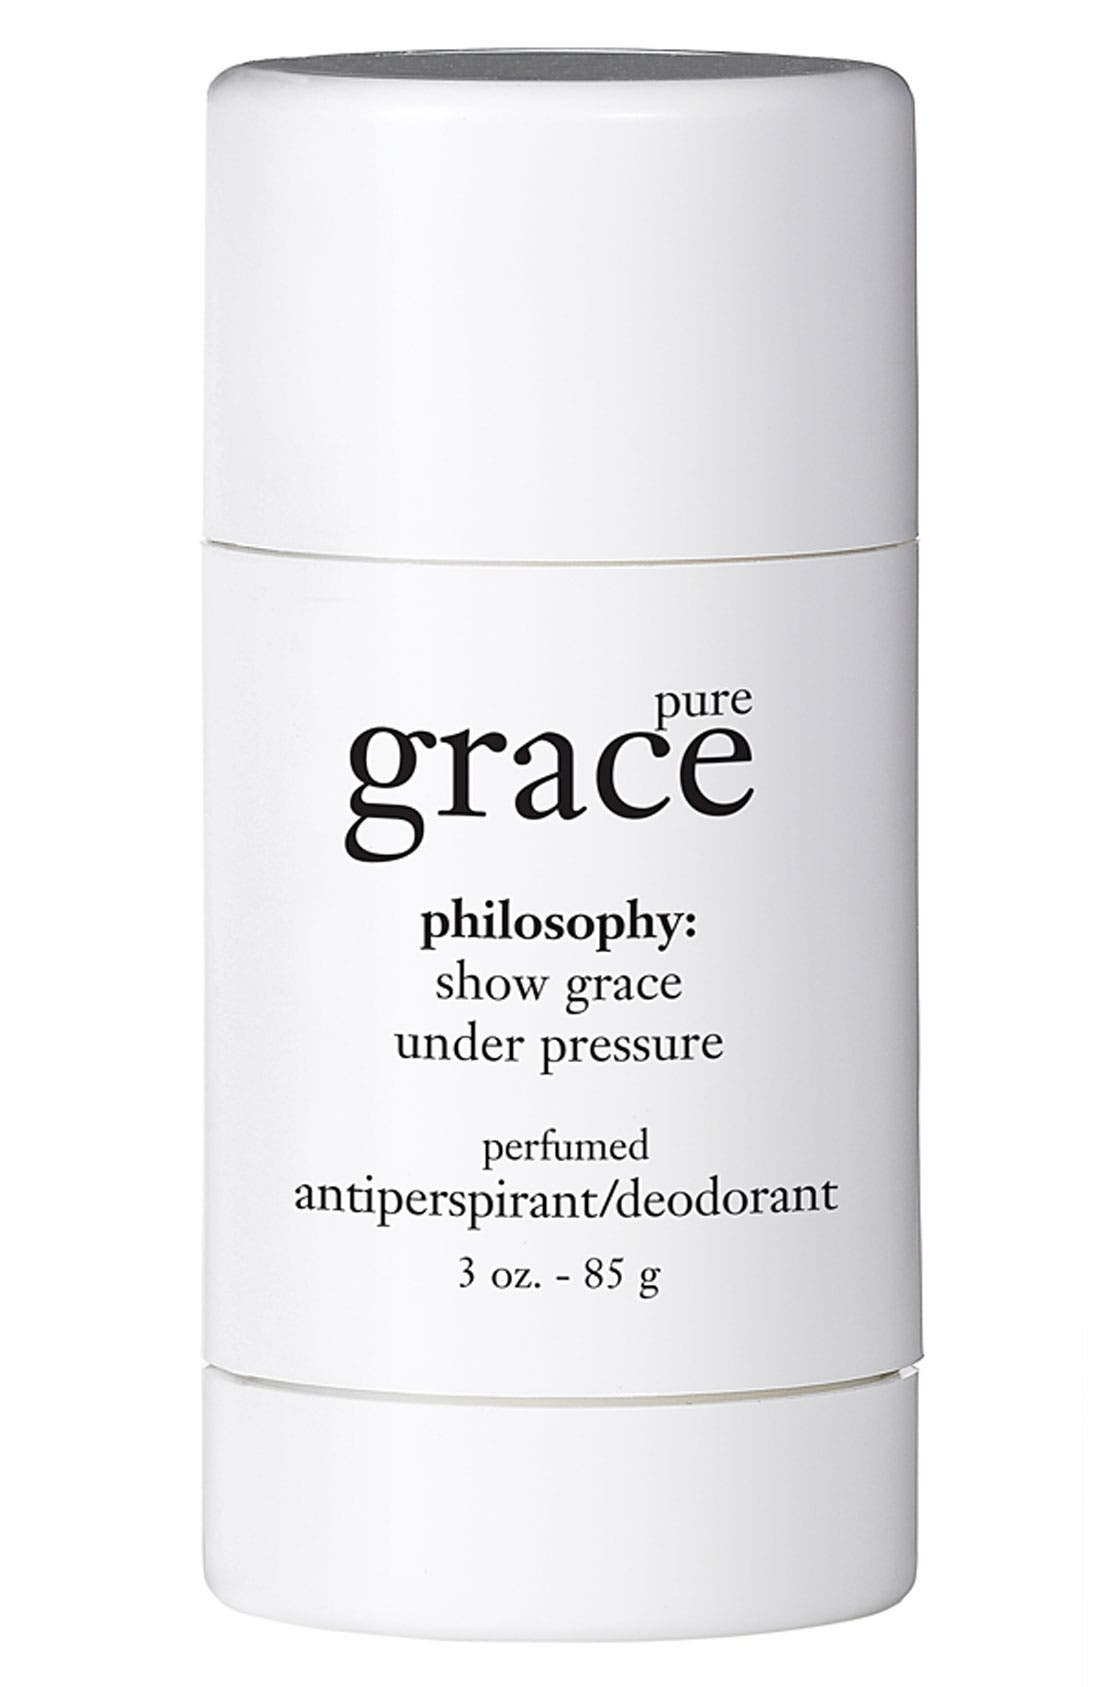 PHILOSOPHY 'pure grace' perfumed antiperspirant /deodorant, Main, color, 000